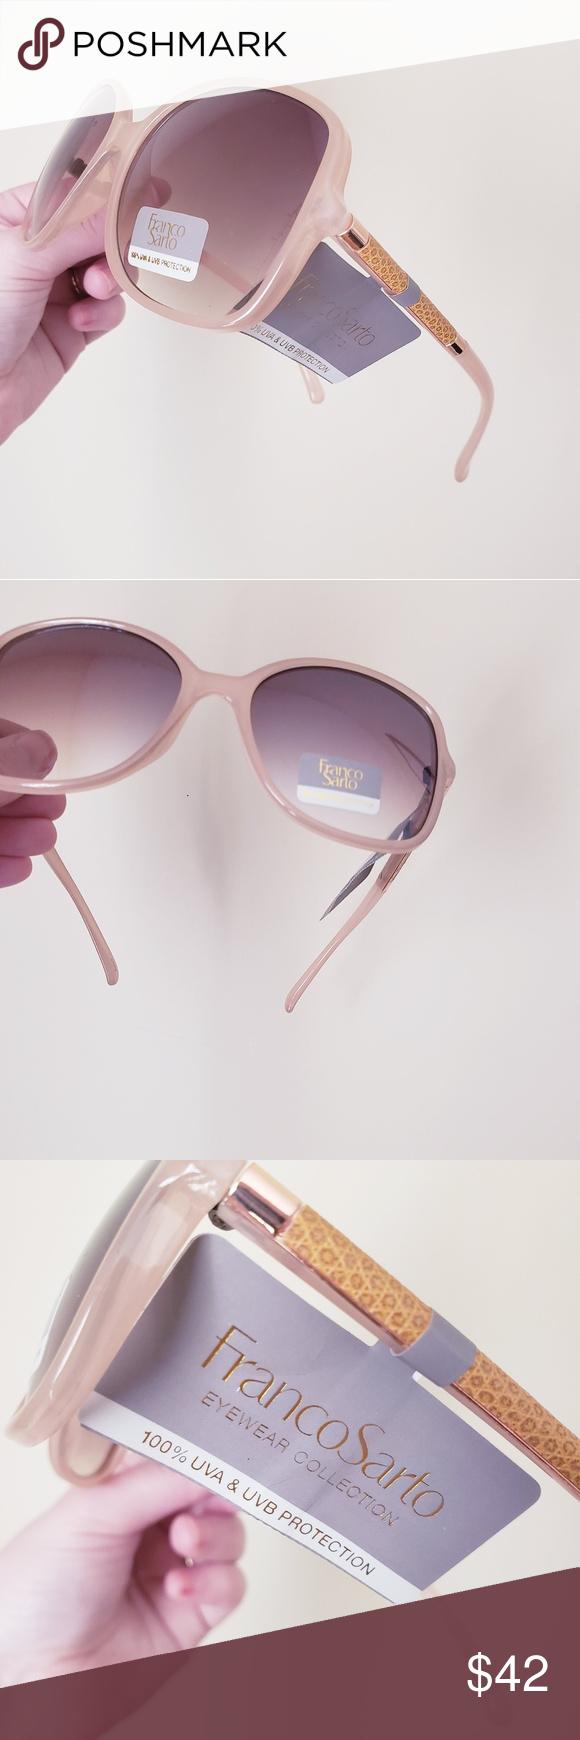 1cd7d1b9fcff Spotted while shopping on Poshmark  NWT Franco Sarto Womens Sunglasses!   poshmark  fashion